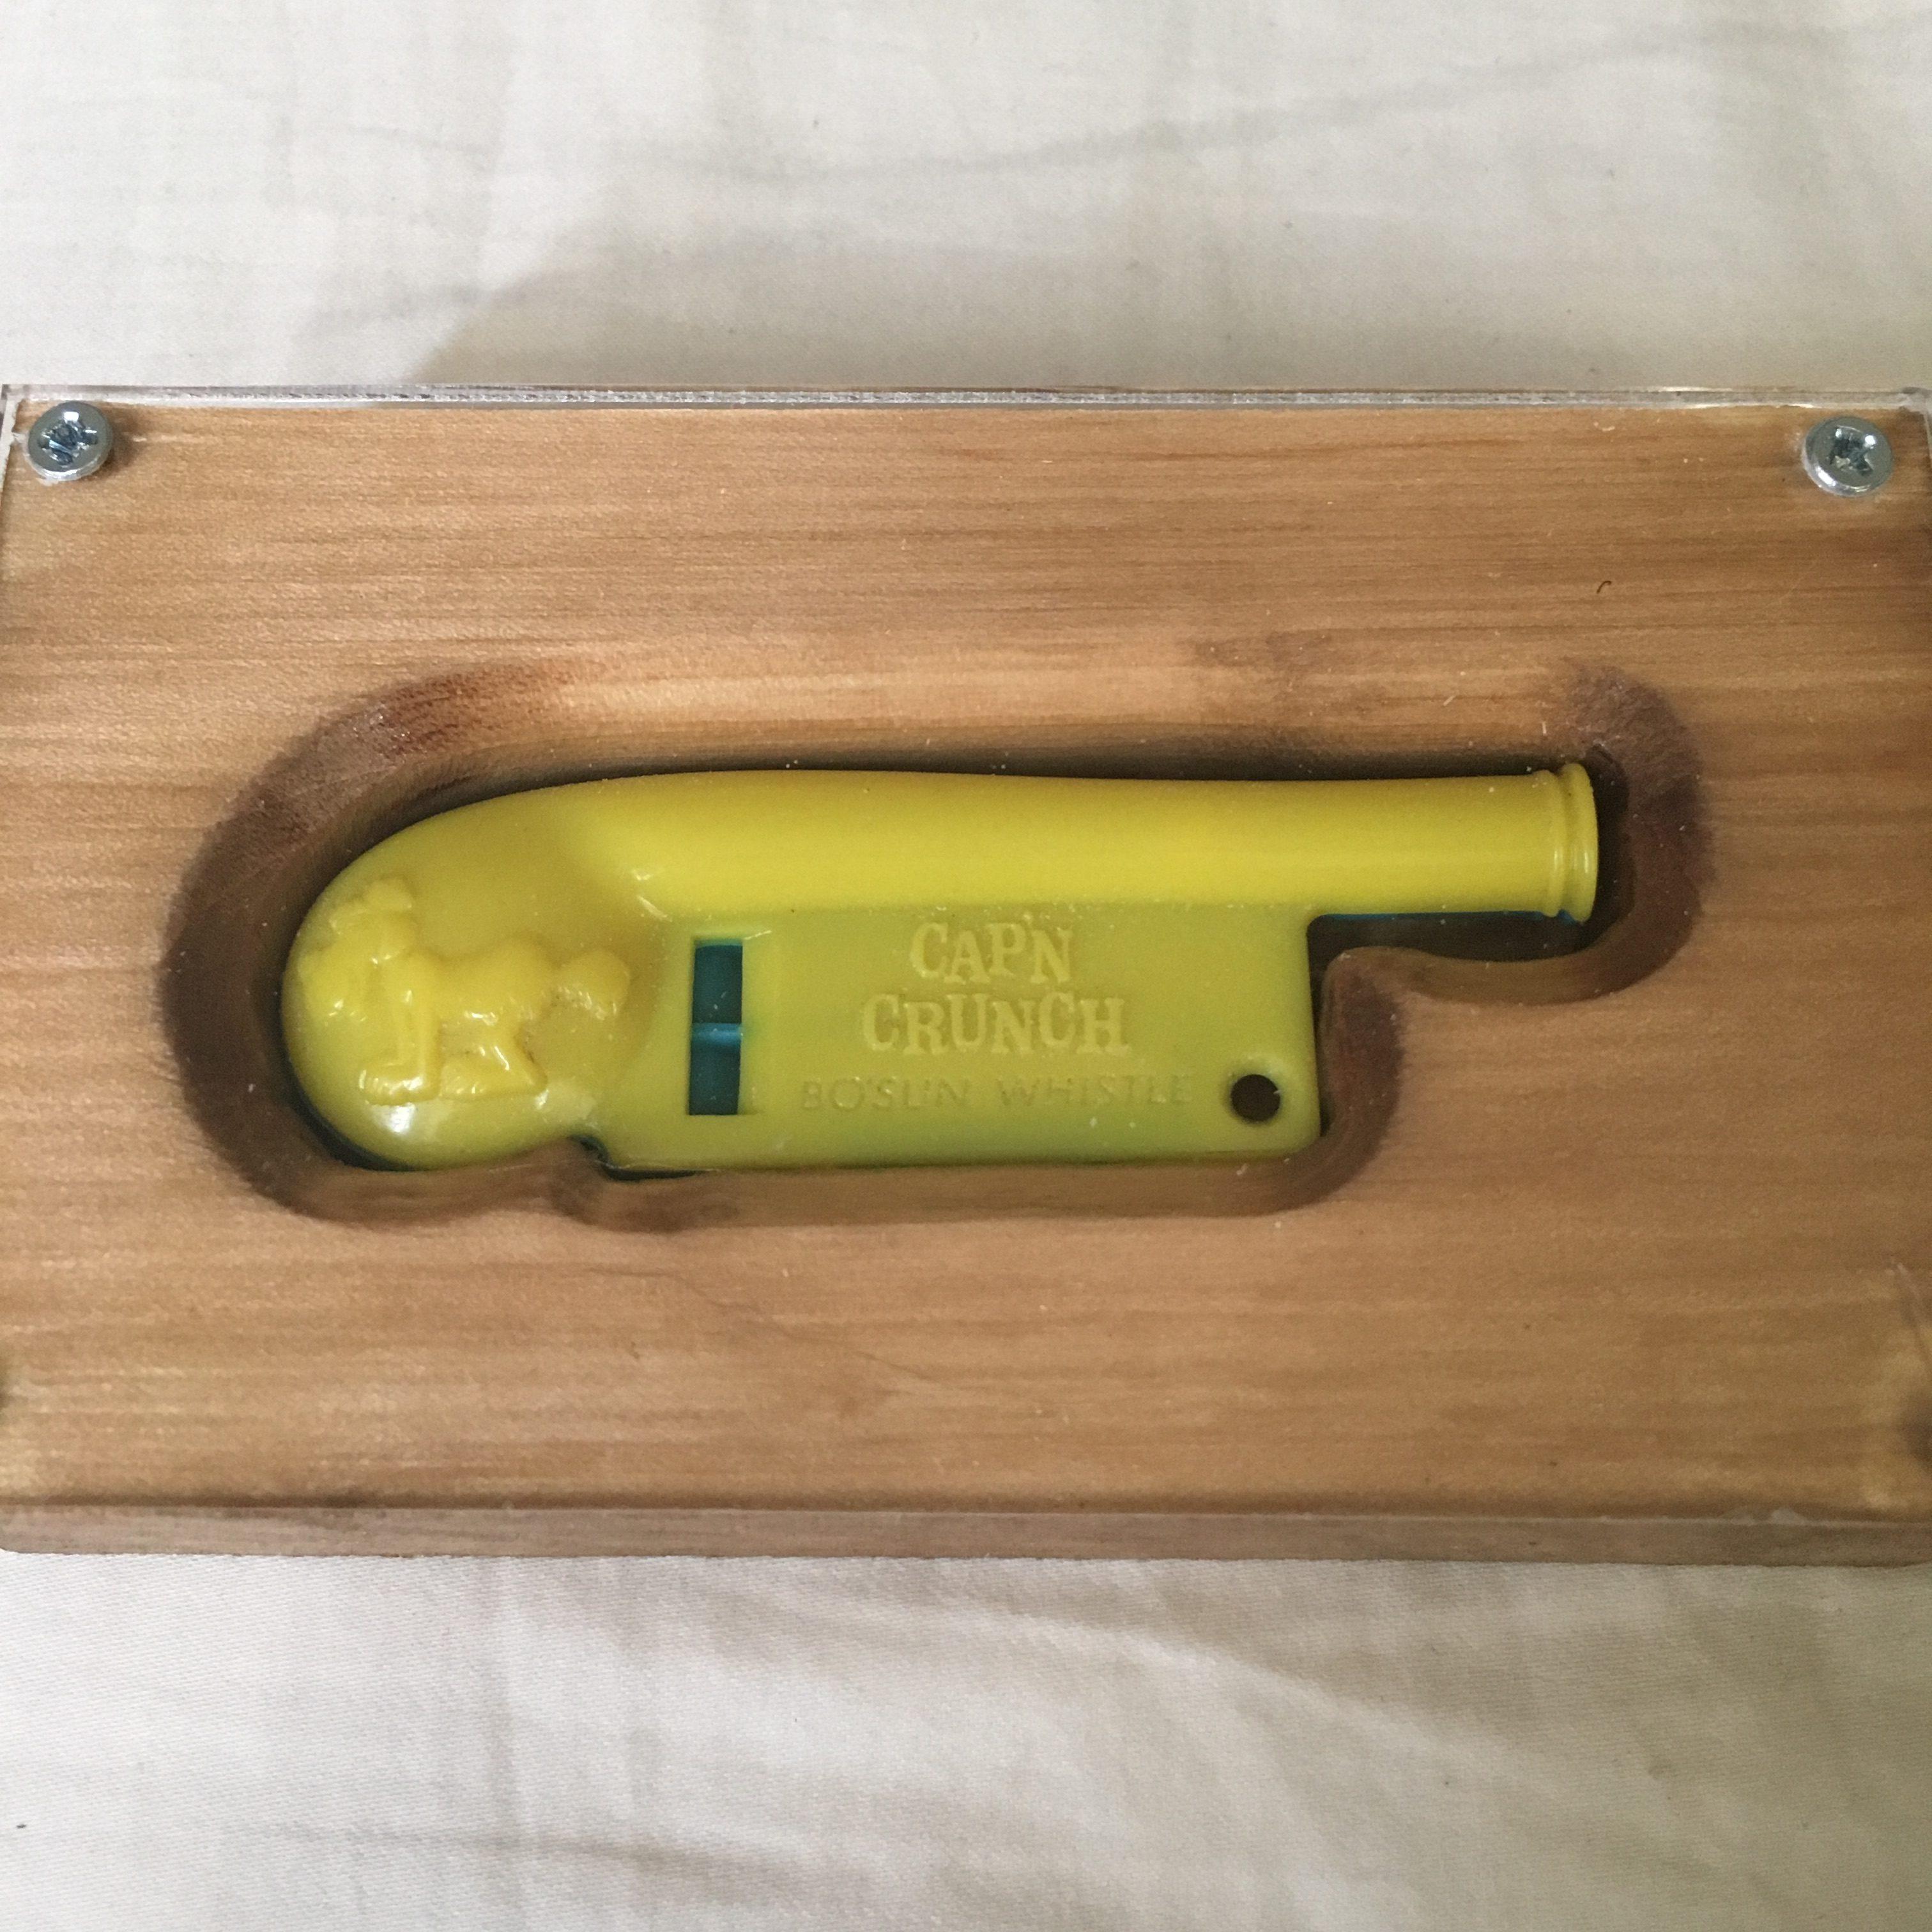 Let's Make a Custom Fit Display Box